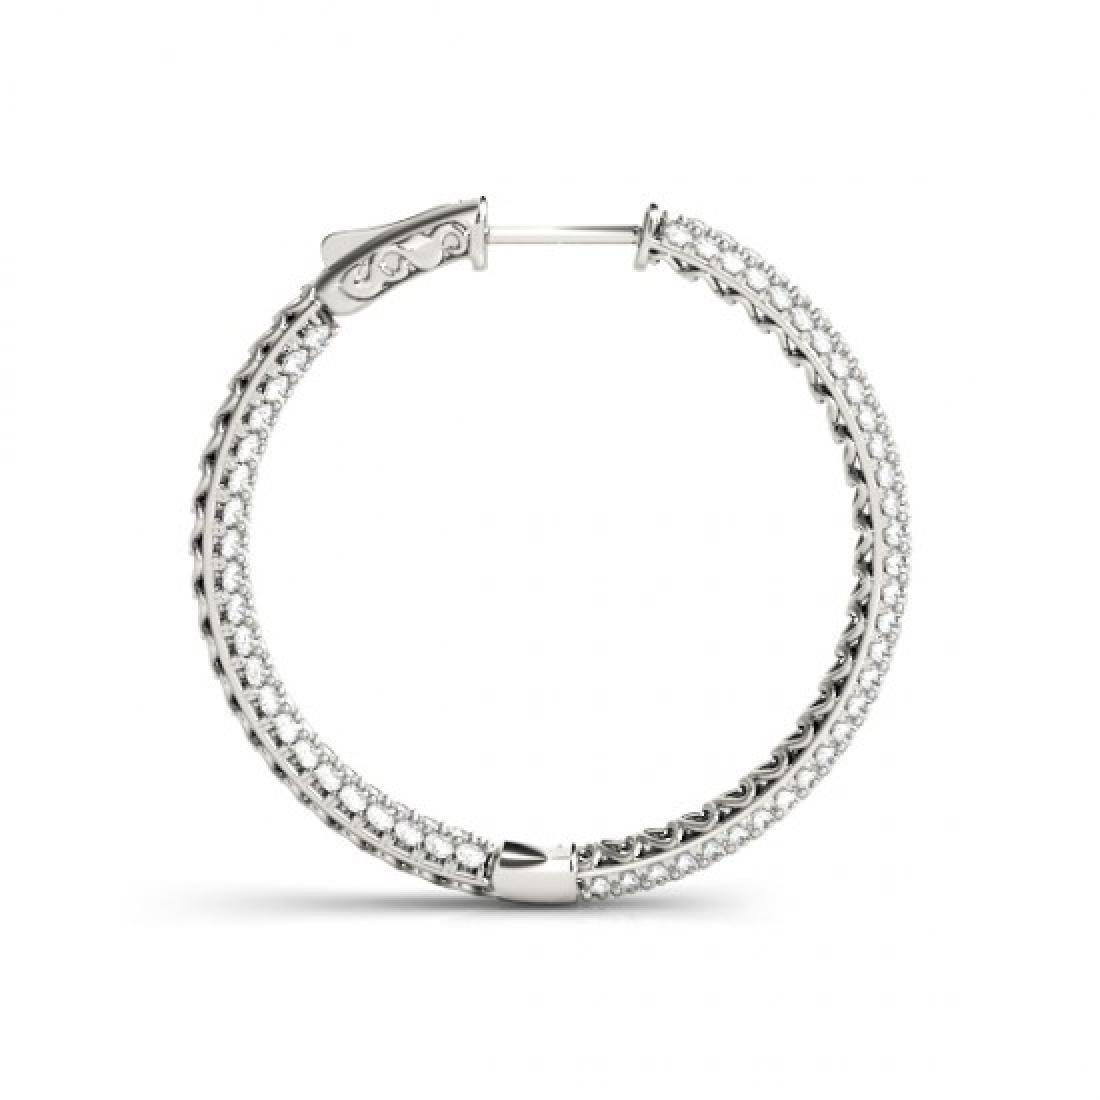 4.5 CTW Diamond VS/SI Certified 36 Mm Hoop Earrings 14K - 3